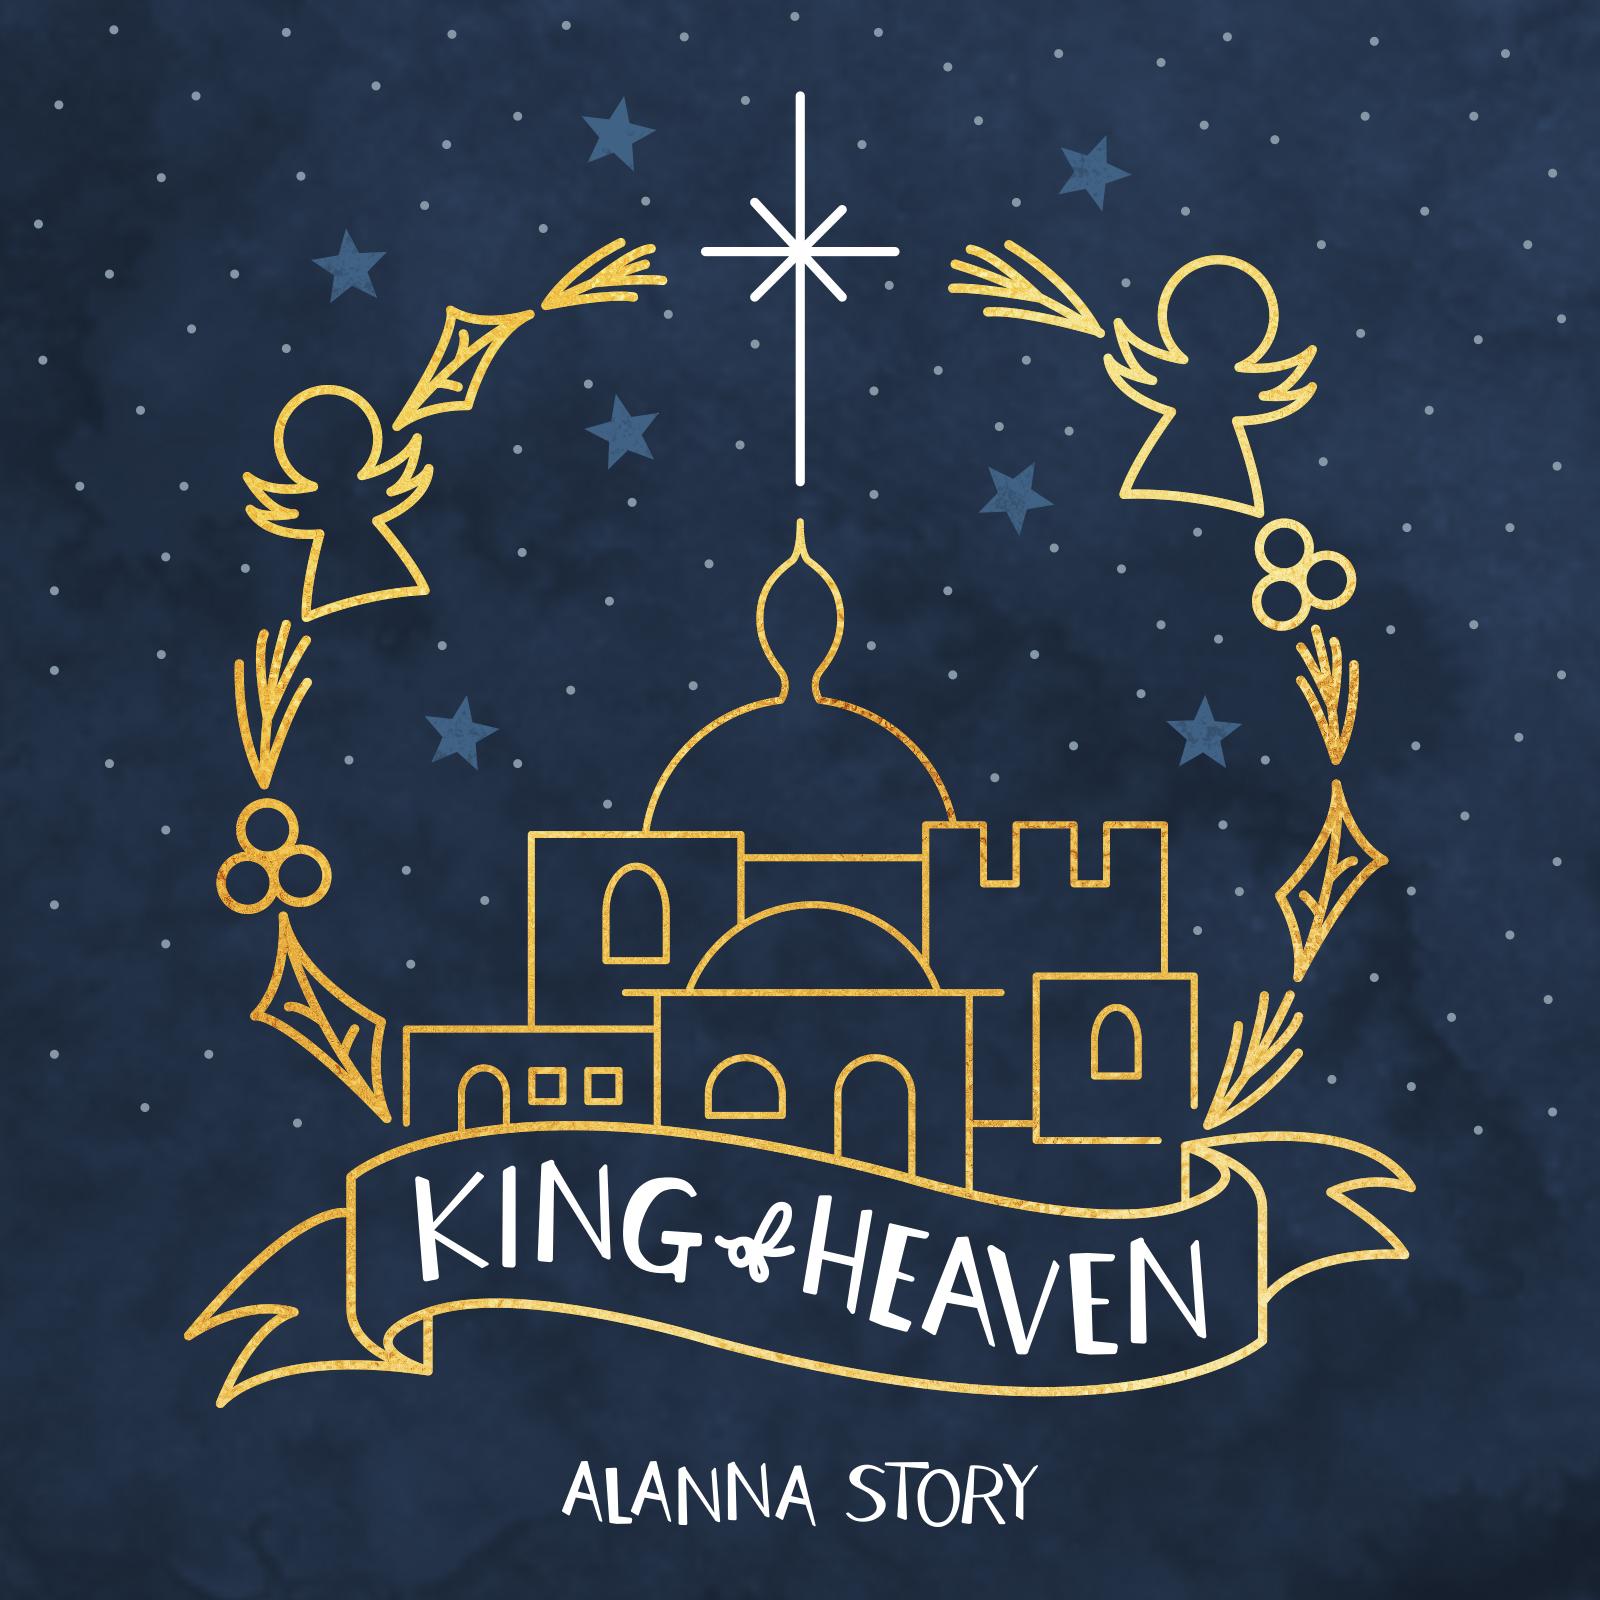 King of Heaven final cover.jpg